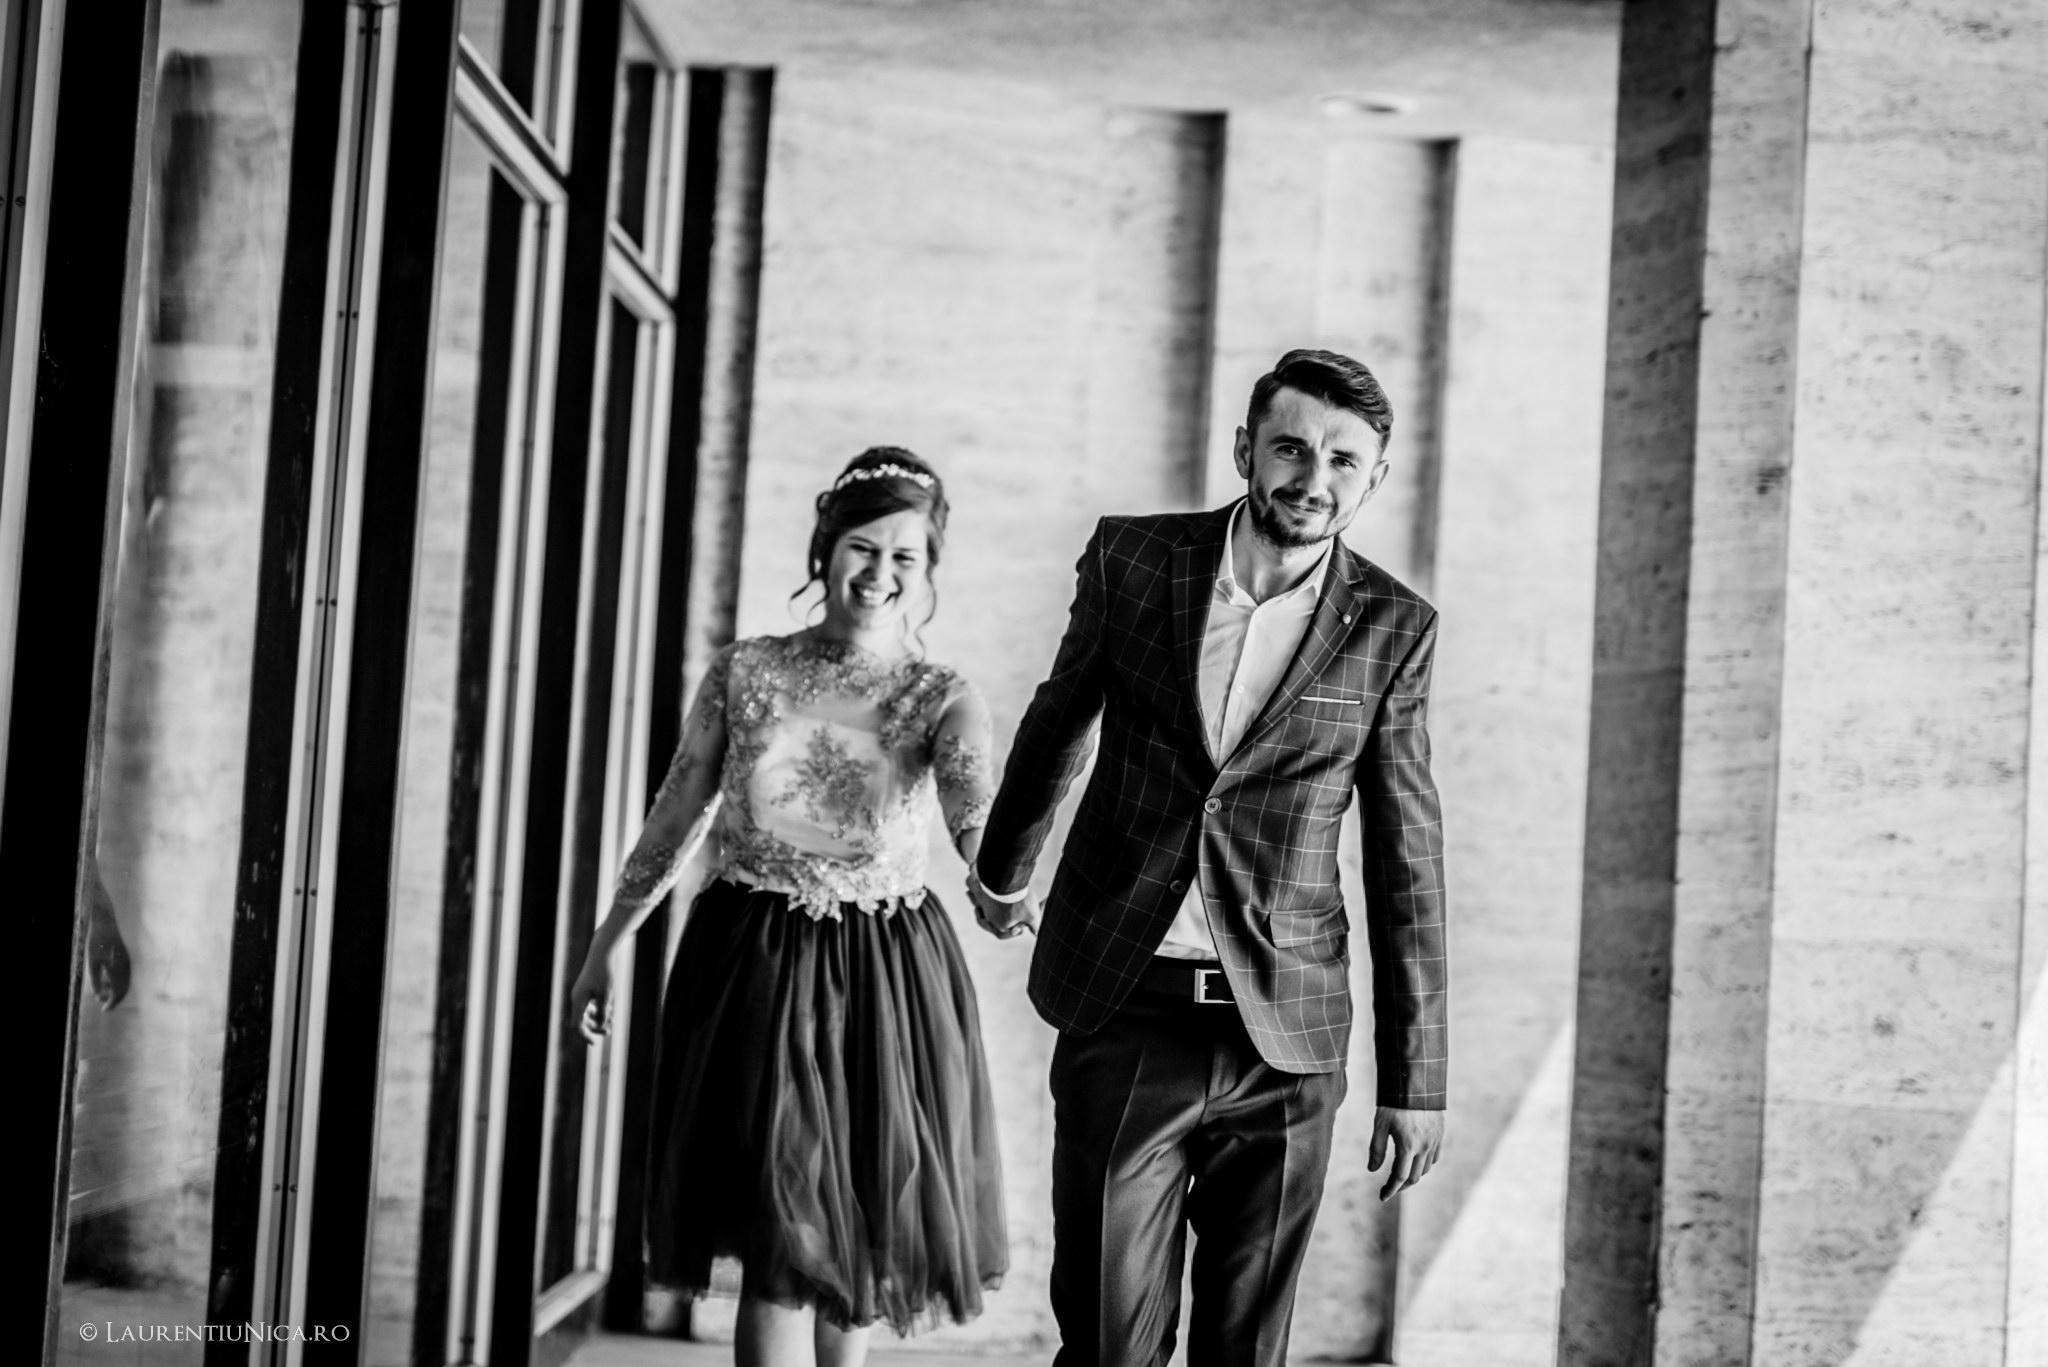 Alina si Andrei fotograf nunta laurentiu nica craiova 13 - Alina & Andrei | Fotografii nunta